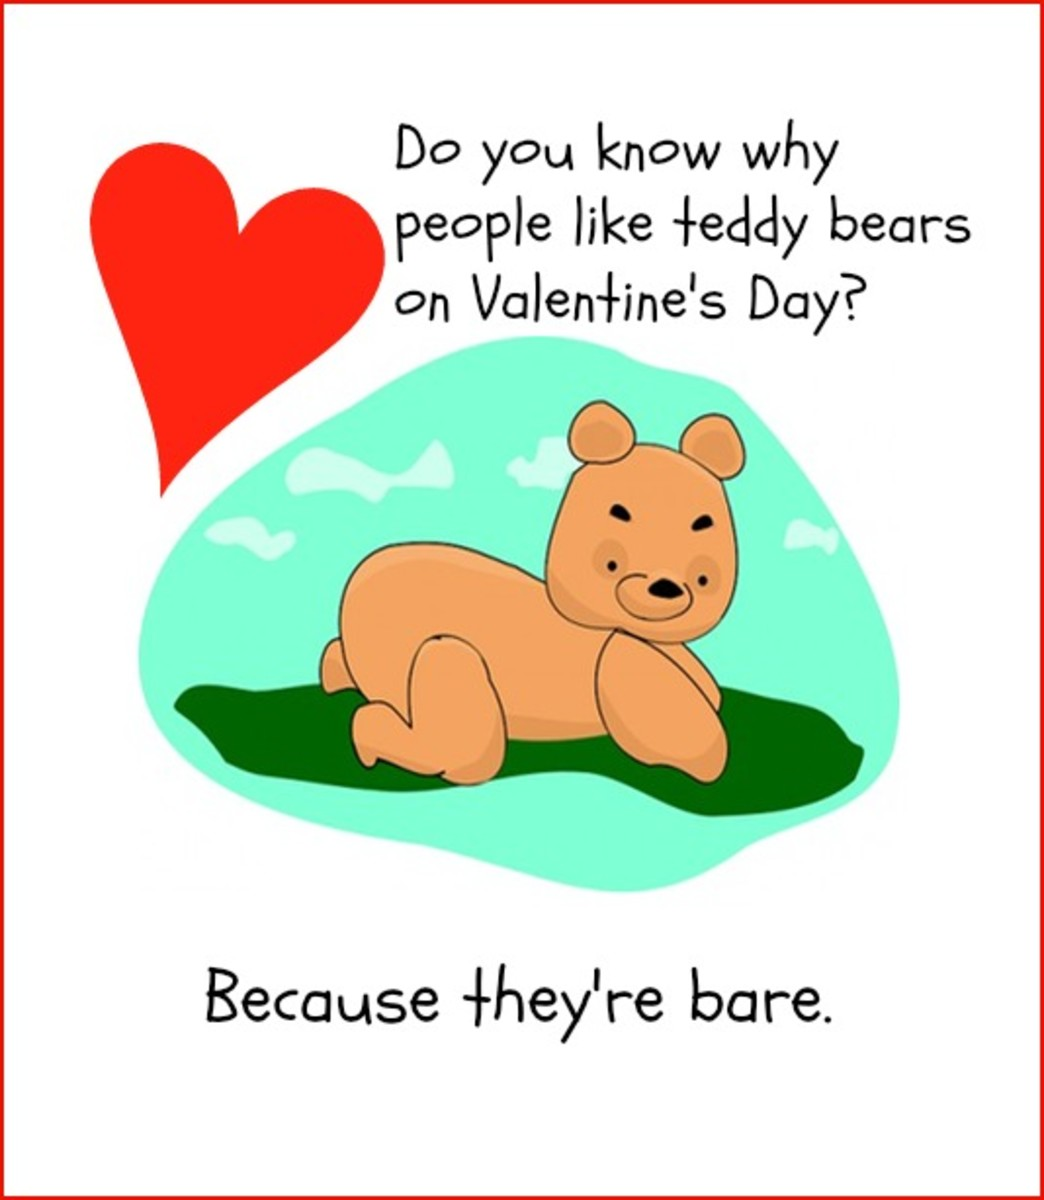 Funny Valentine's Day Card with Teddy Bear Joke